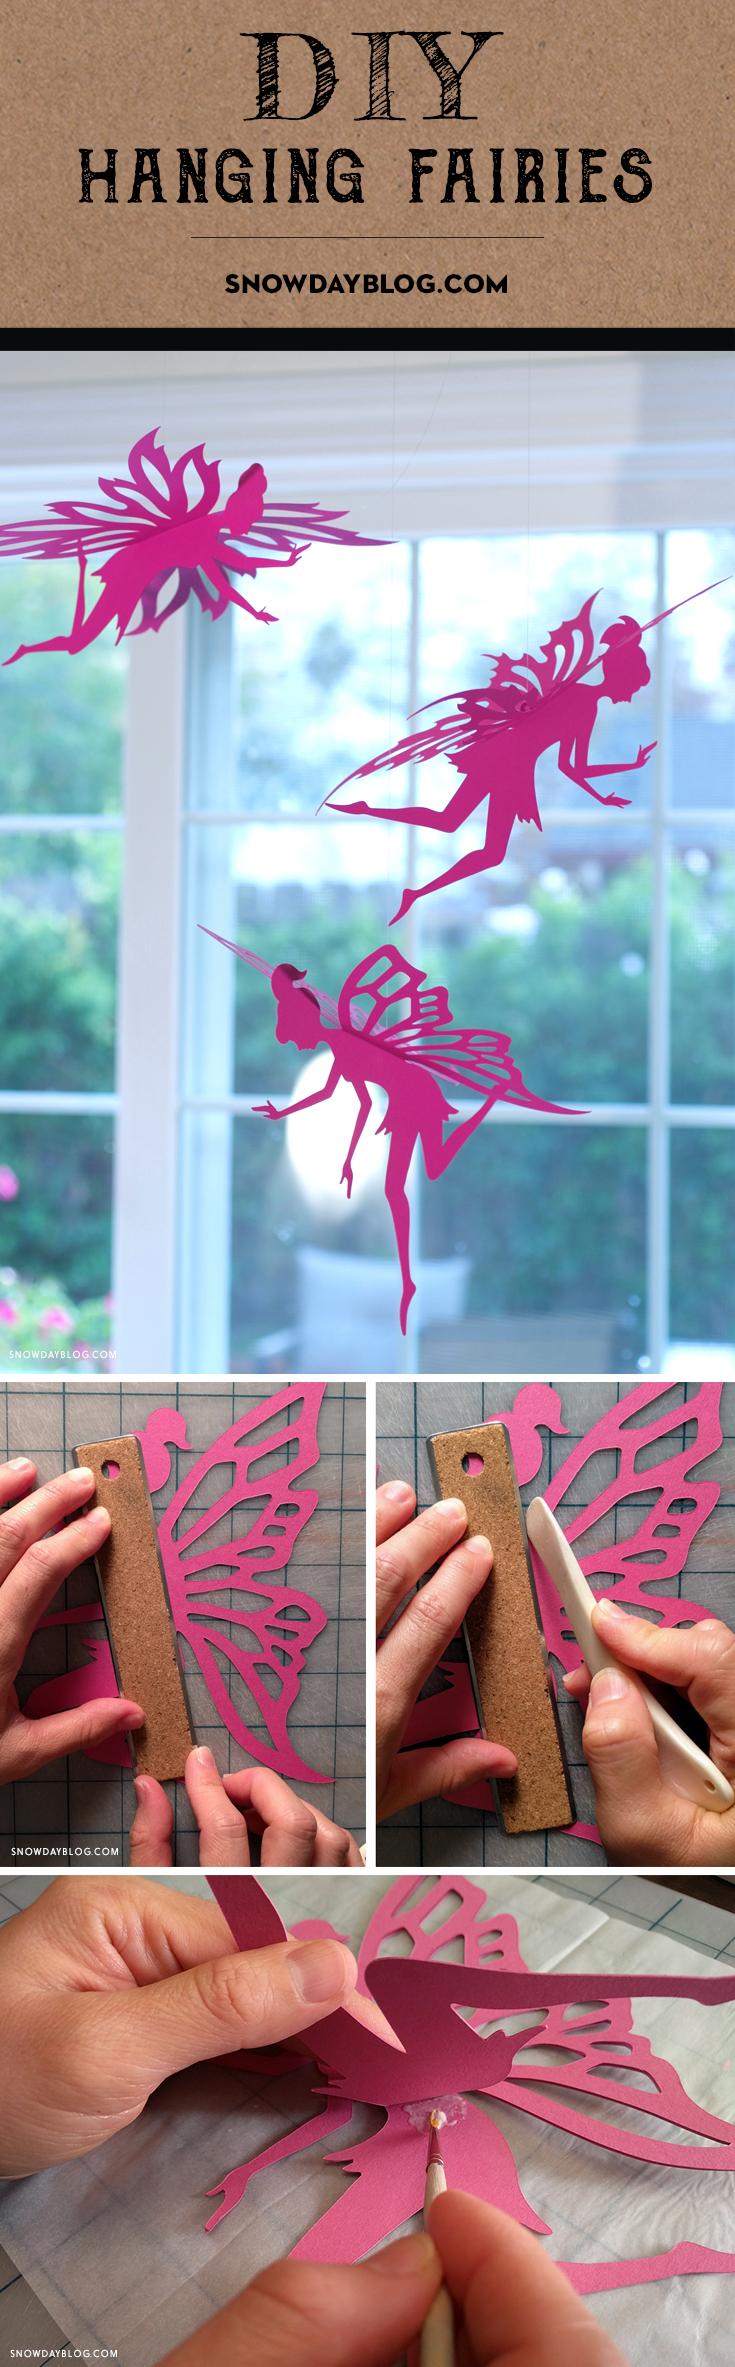 Hanging Fairies Pinterest Magenta